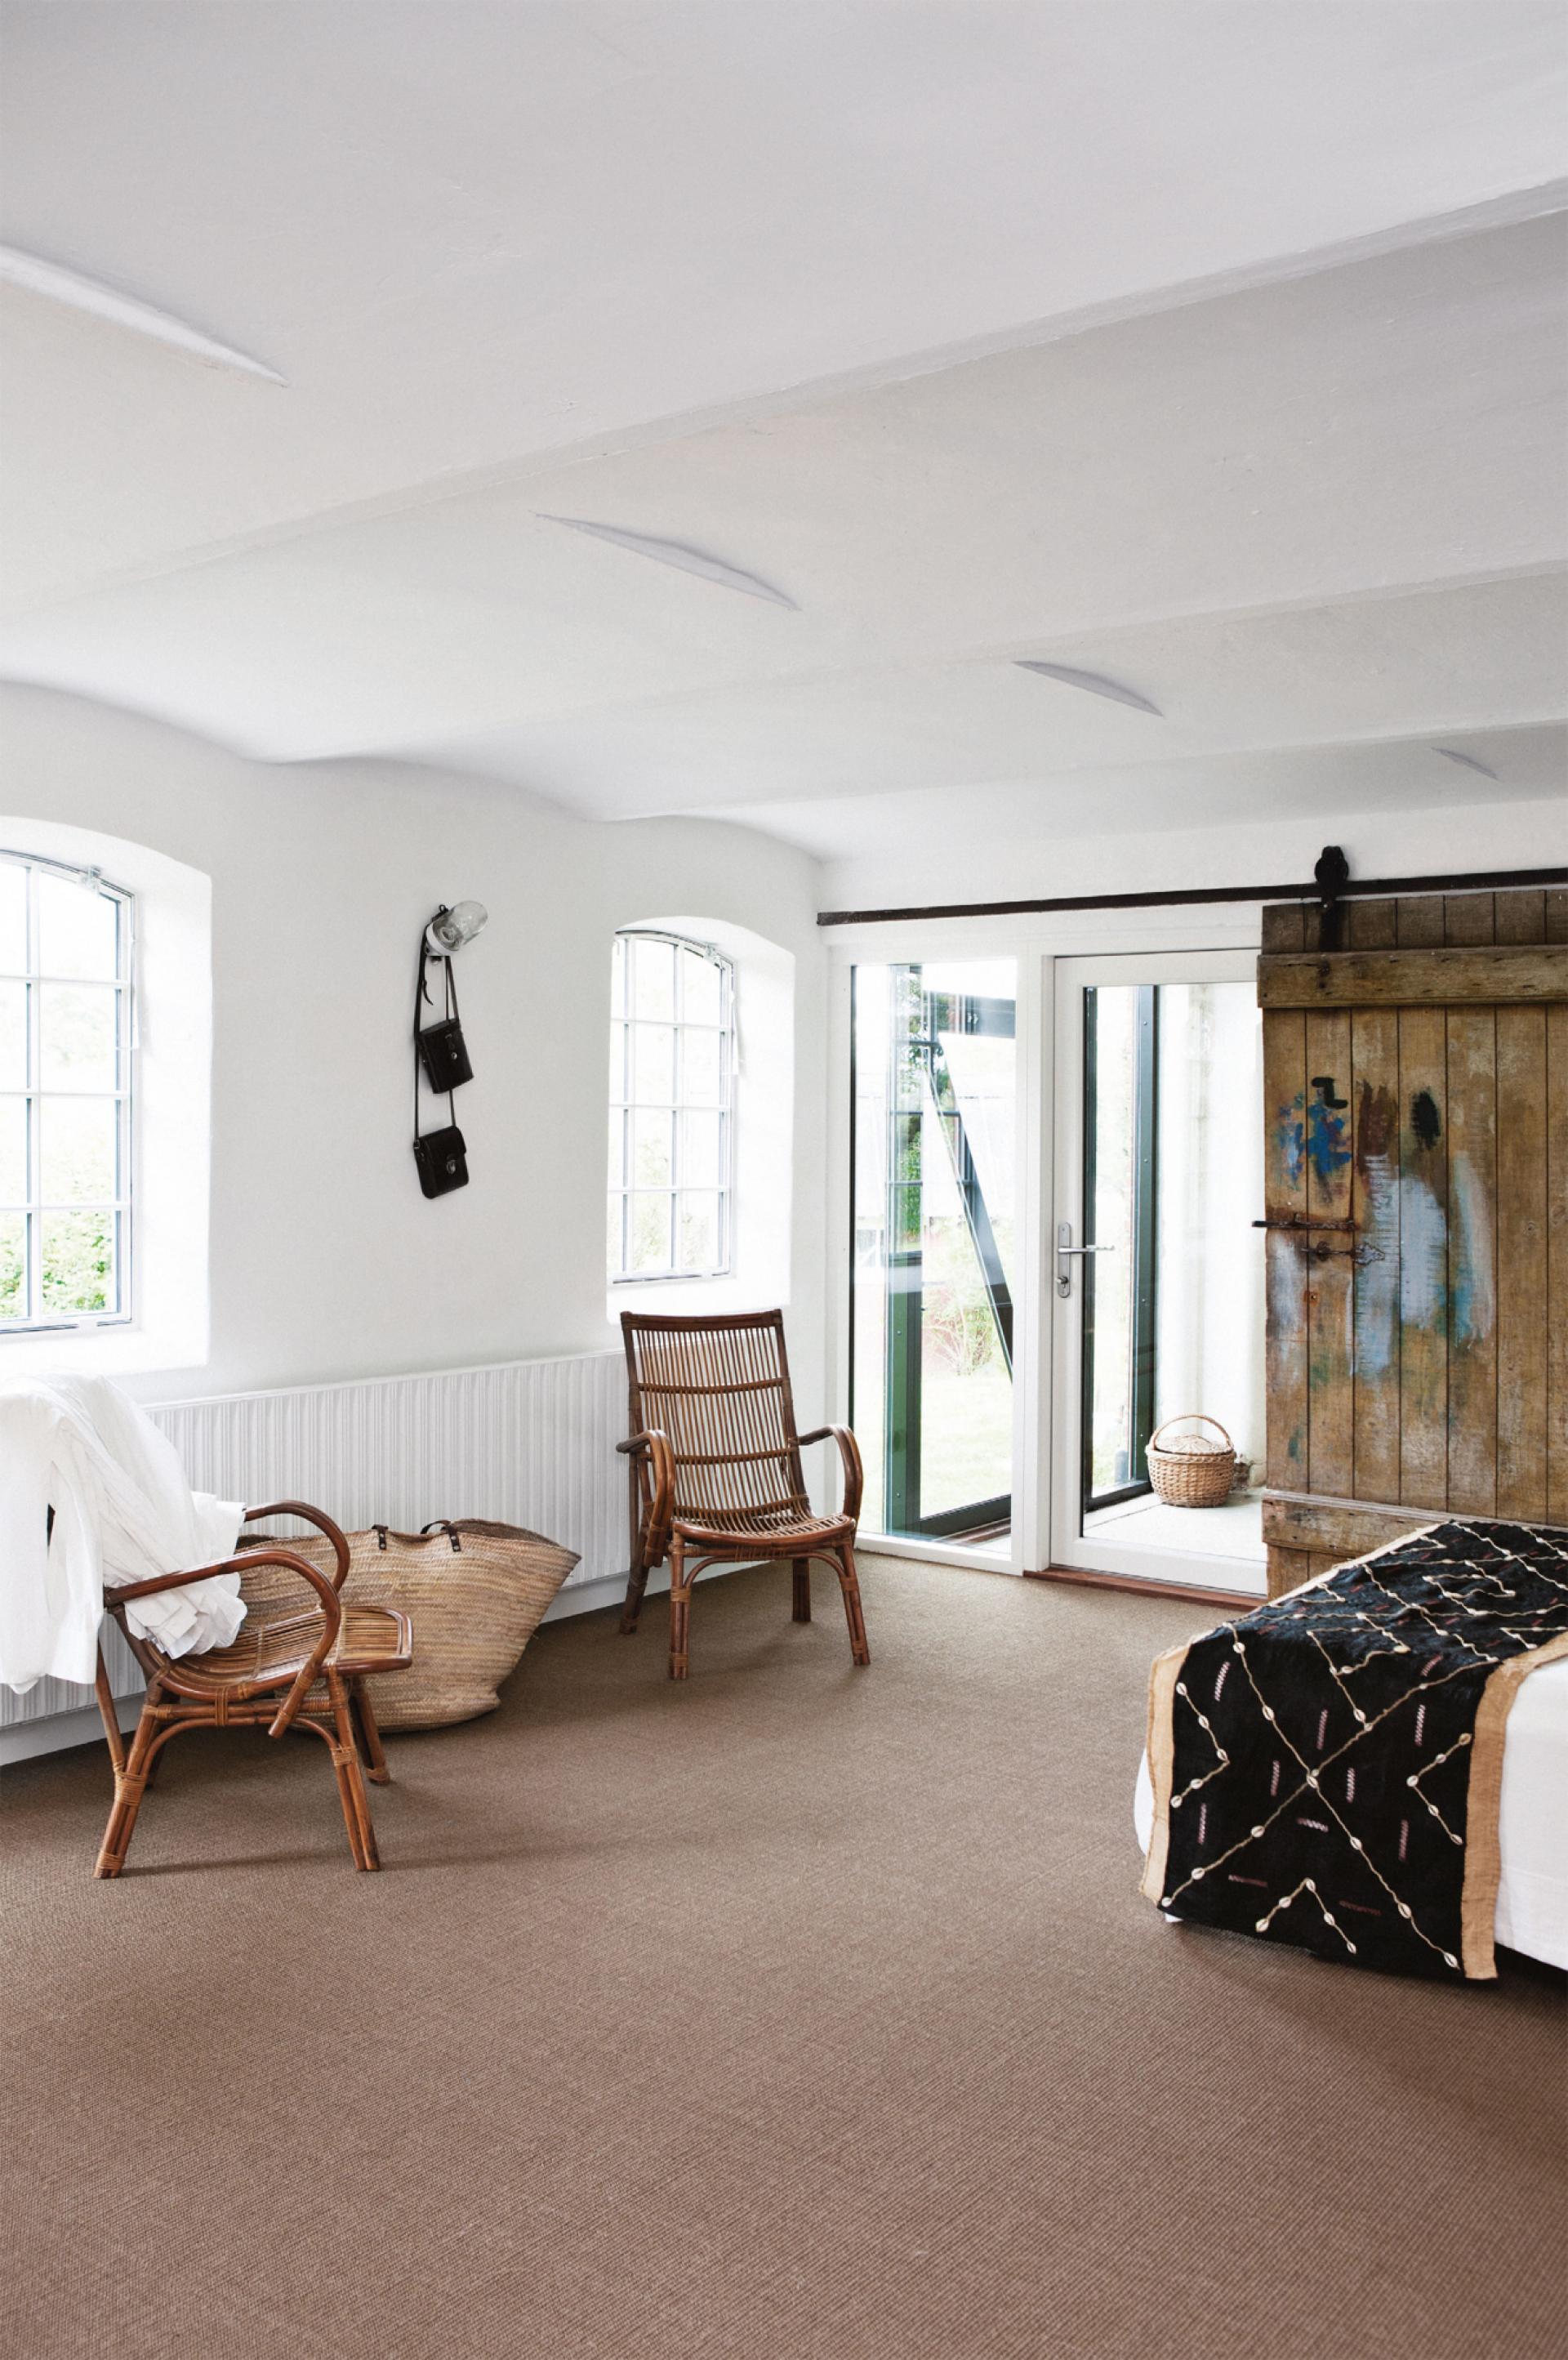 dans une maison de campagne danoise lili in wonderland. Black Bedroom Furniture Sets. Home Design Ideas